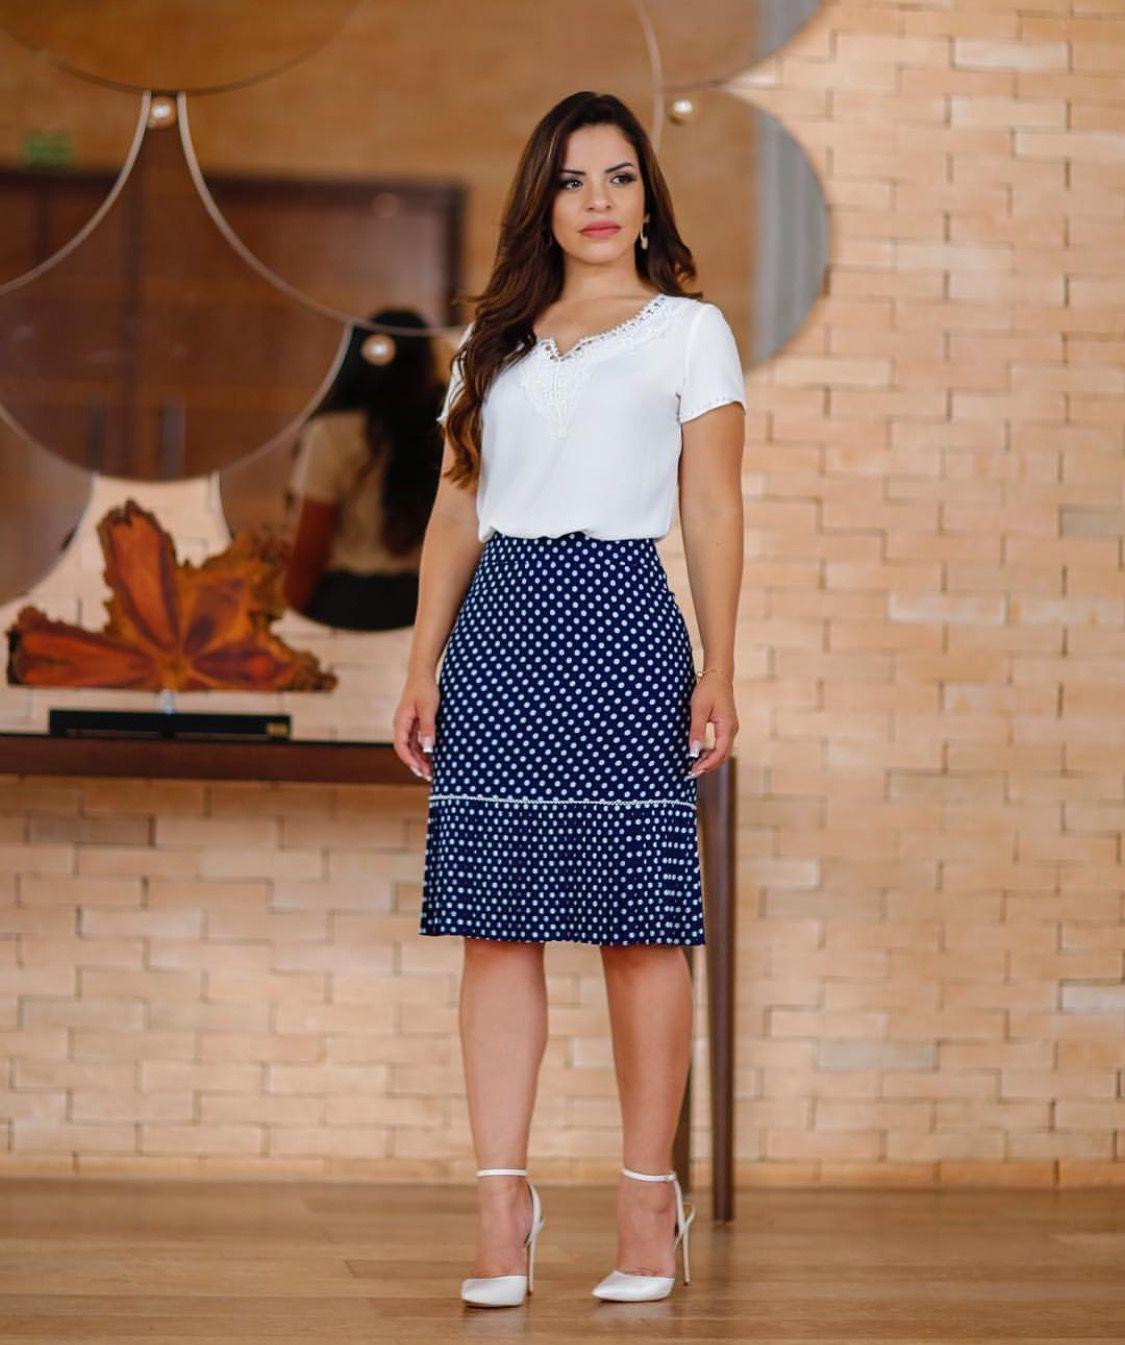 75f95ef04 Sapatos Brancos, Saia Social, Saia Justa, Moda Evangelica Feminina, Looks  Sociais,